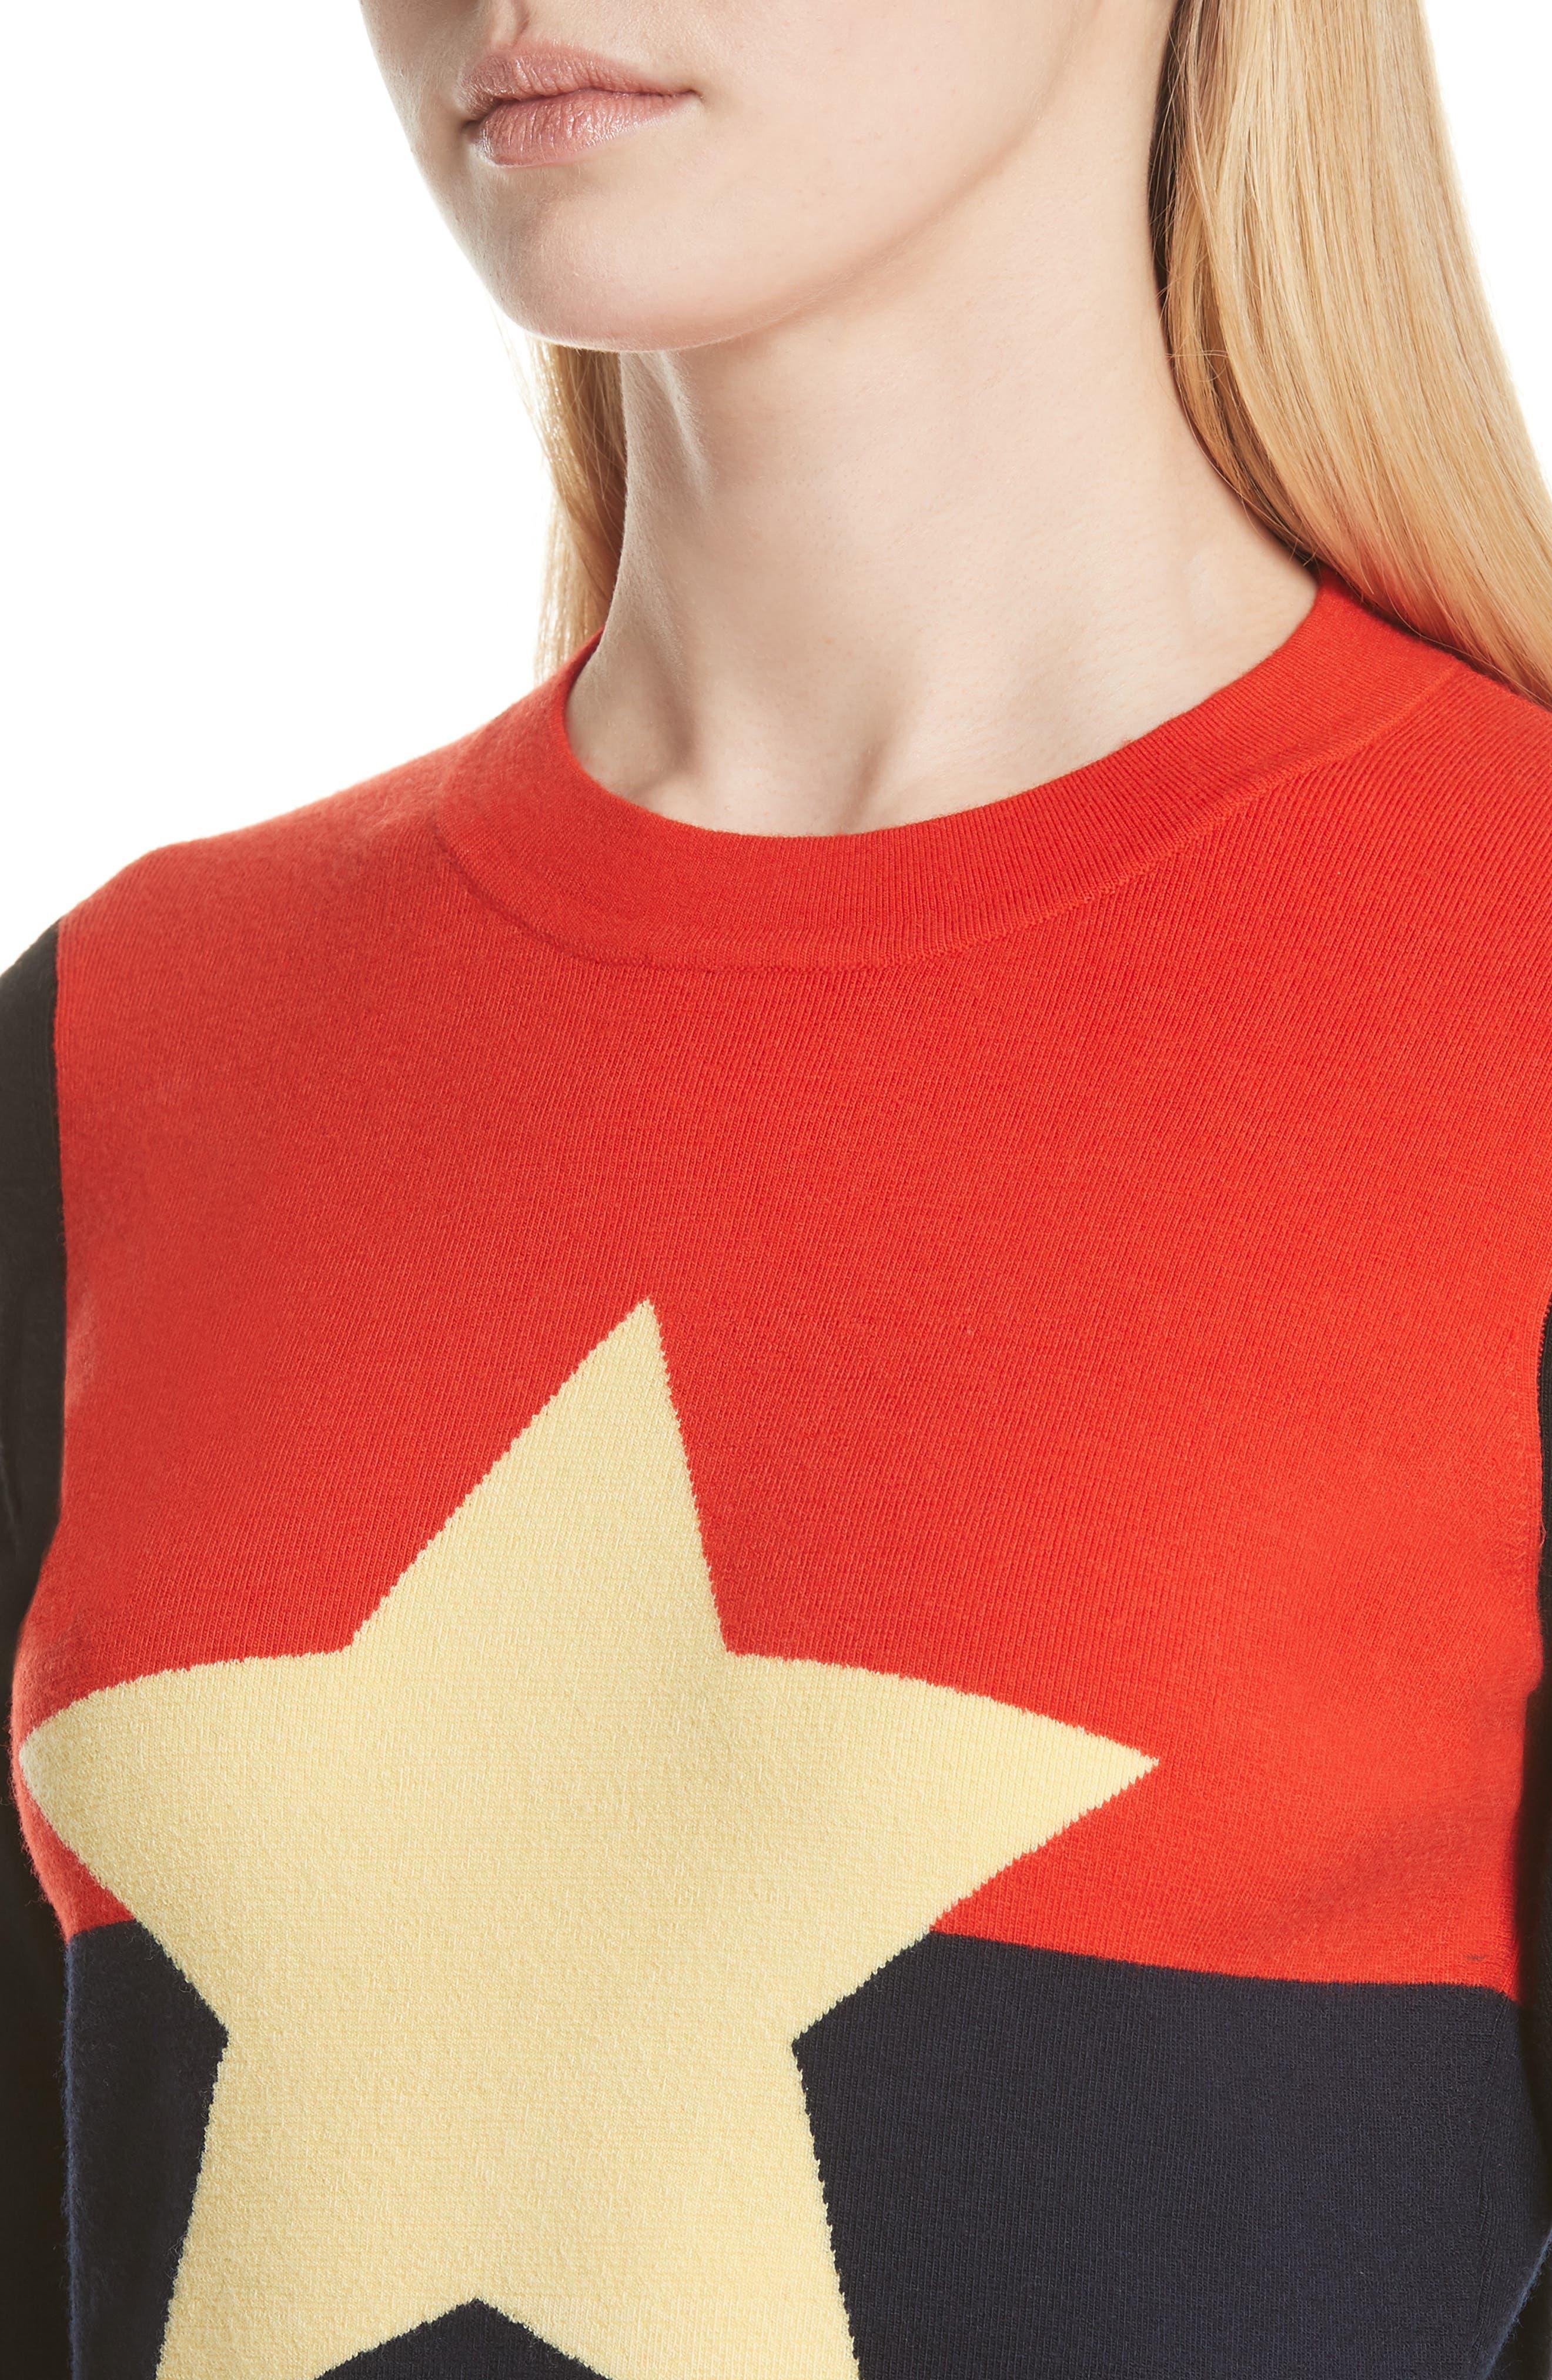 Diane von Furstenberg Star Sweater,                             Alternate thumbnail 4, color,                             Poppy Multi